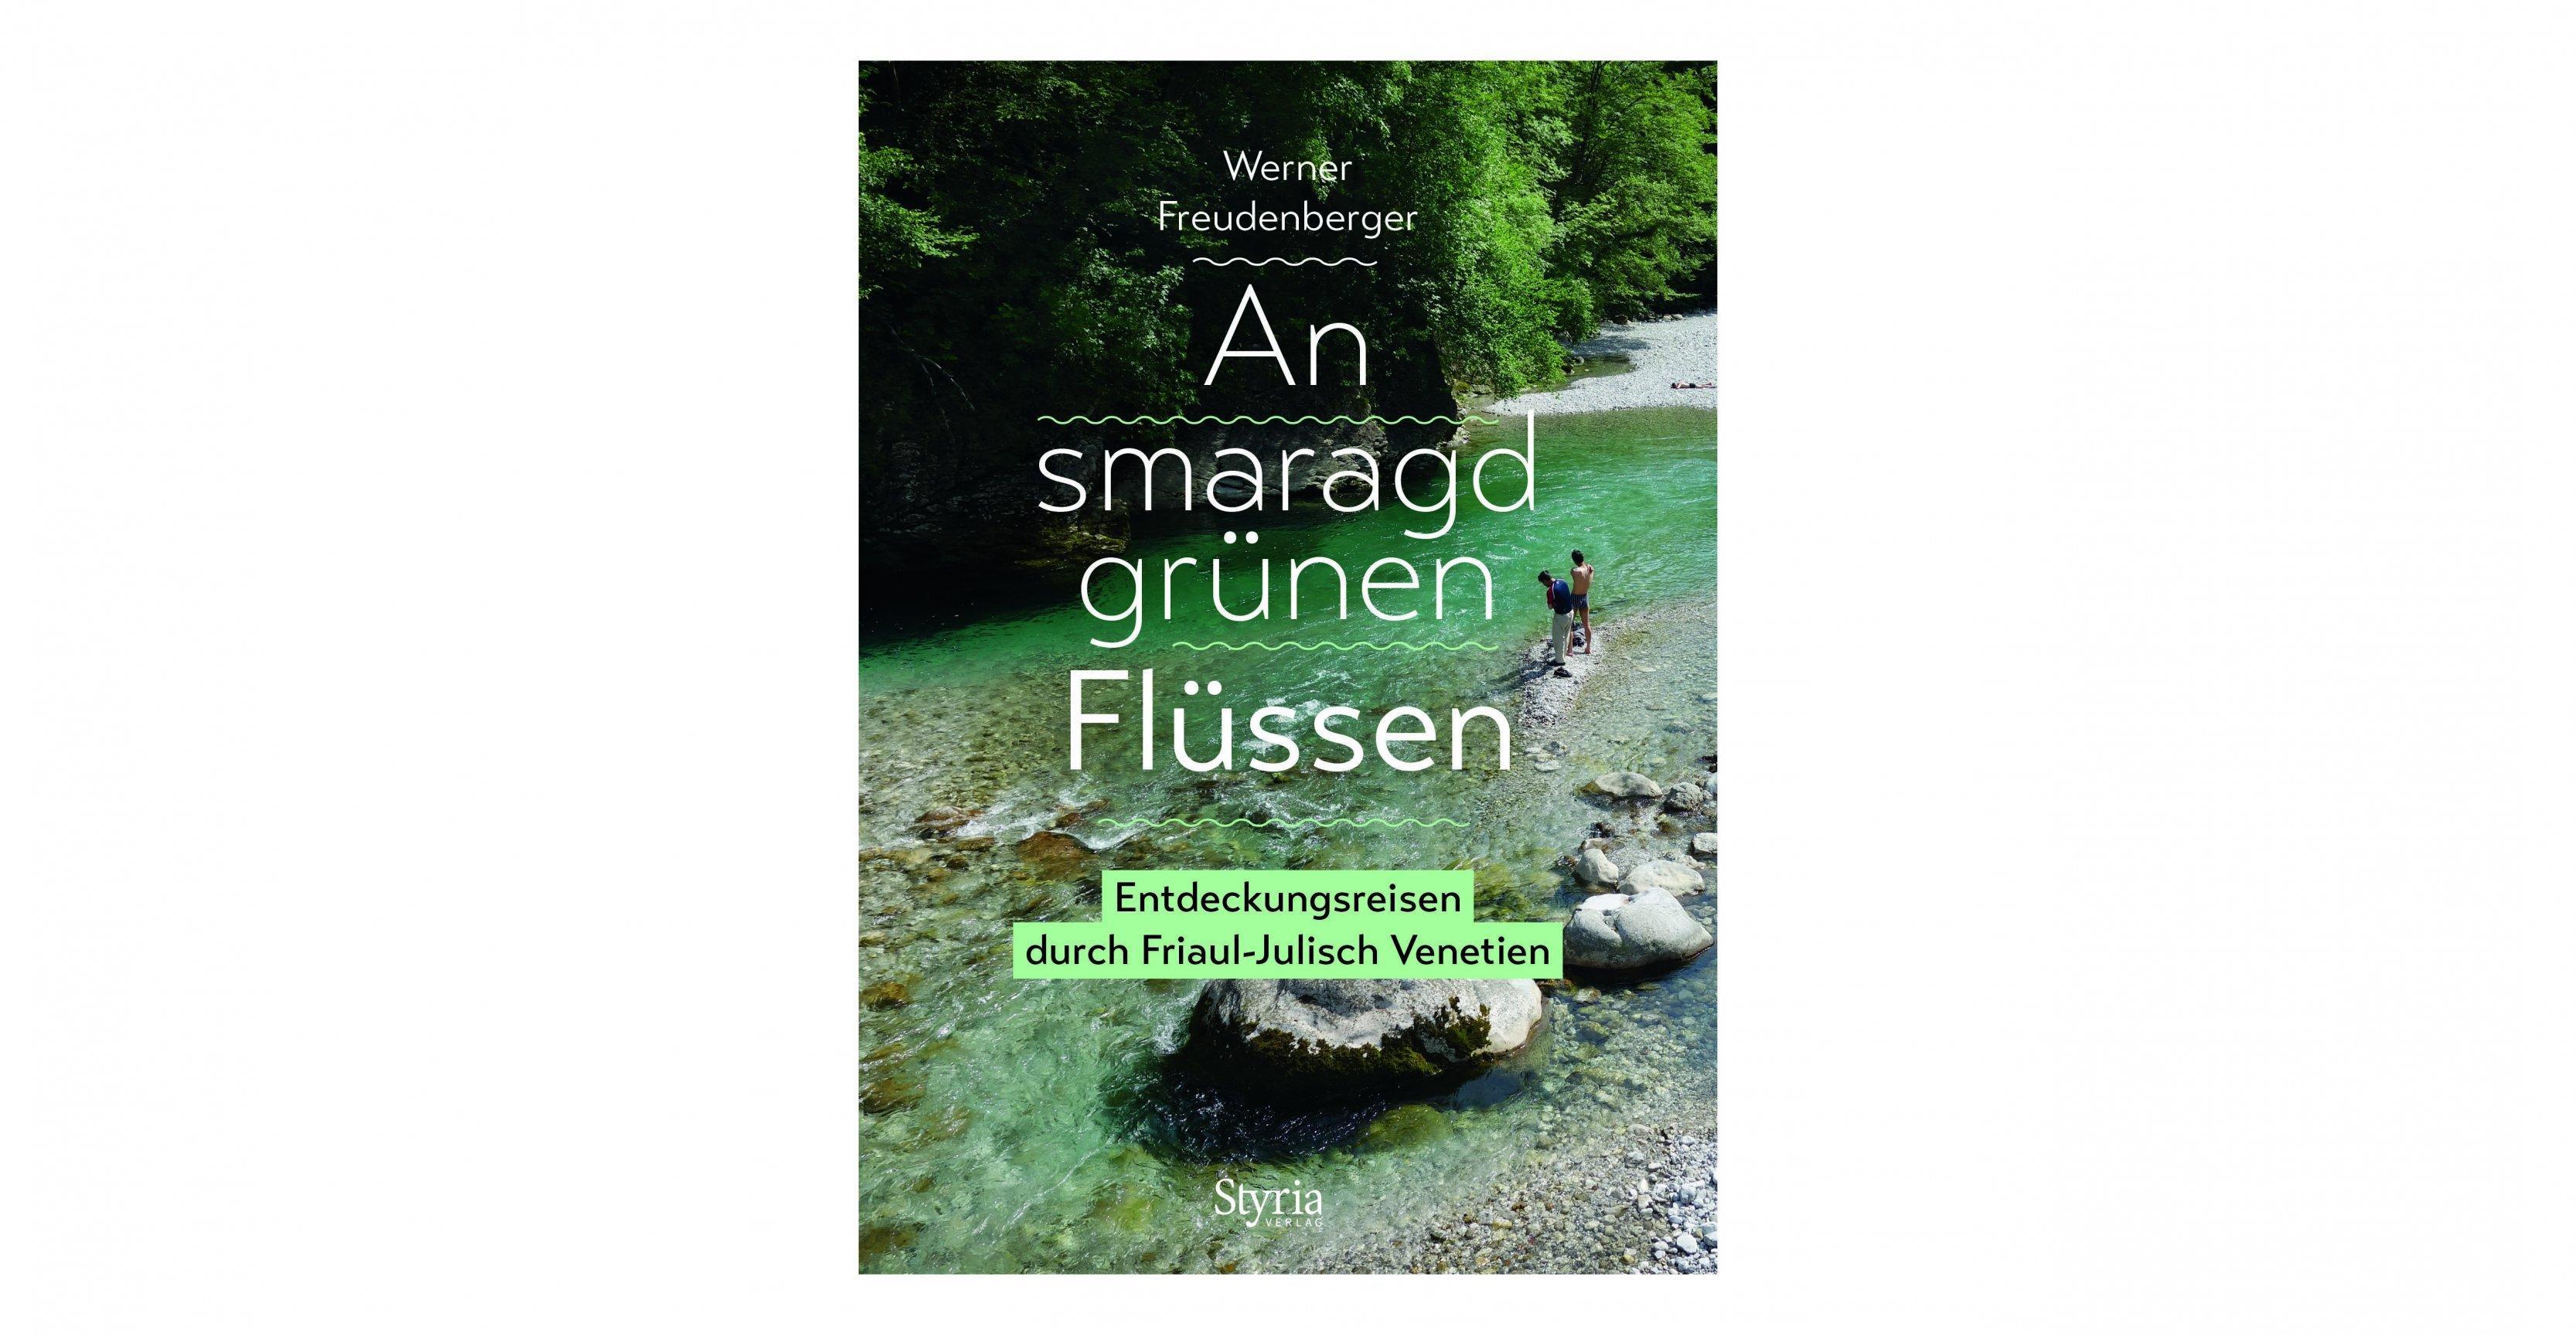 Buchcover eines smaragdgrünen Flusses